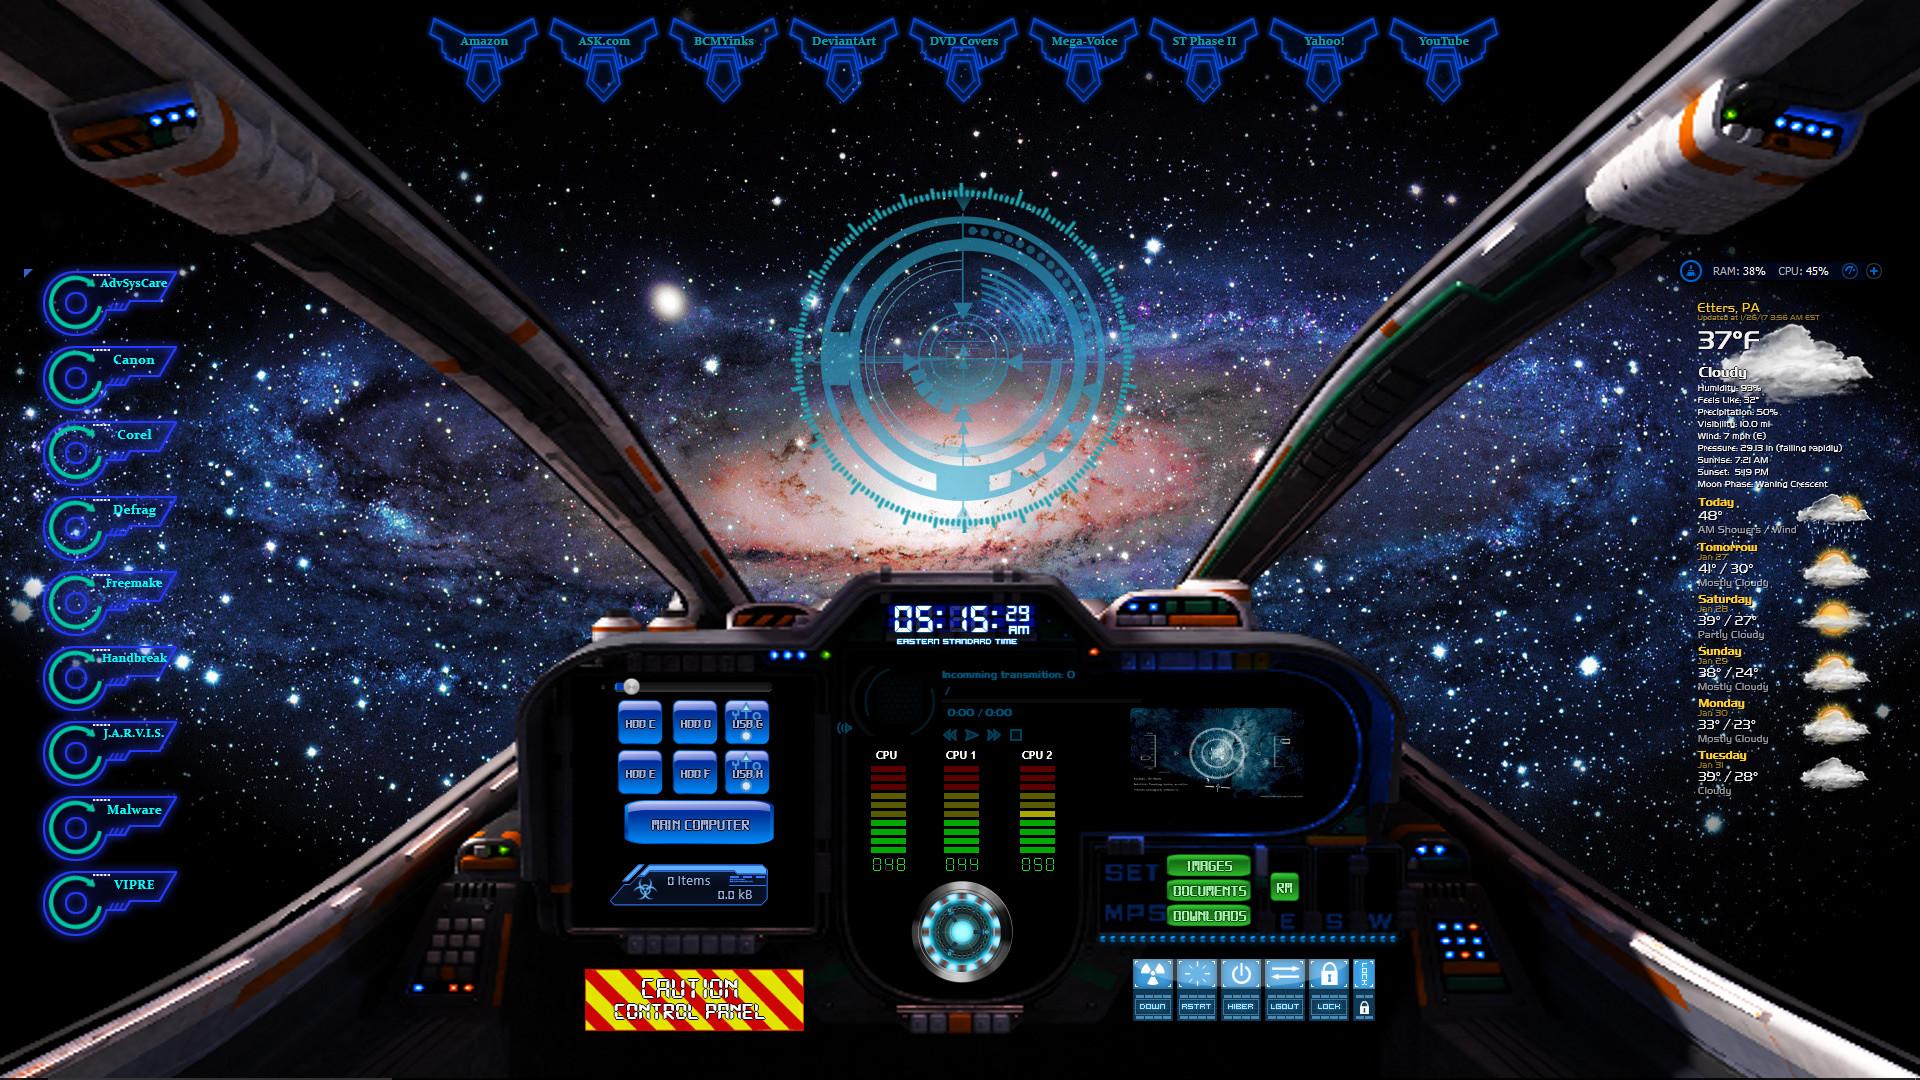 Spaceship Cockpit by oldcrow10 Spaceship Cockpit by oldcrow10